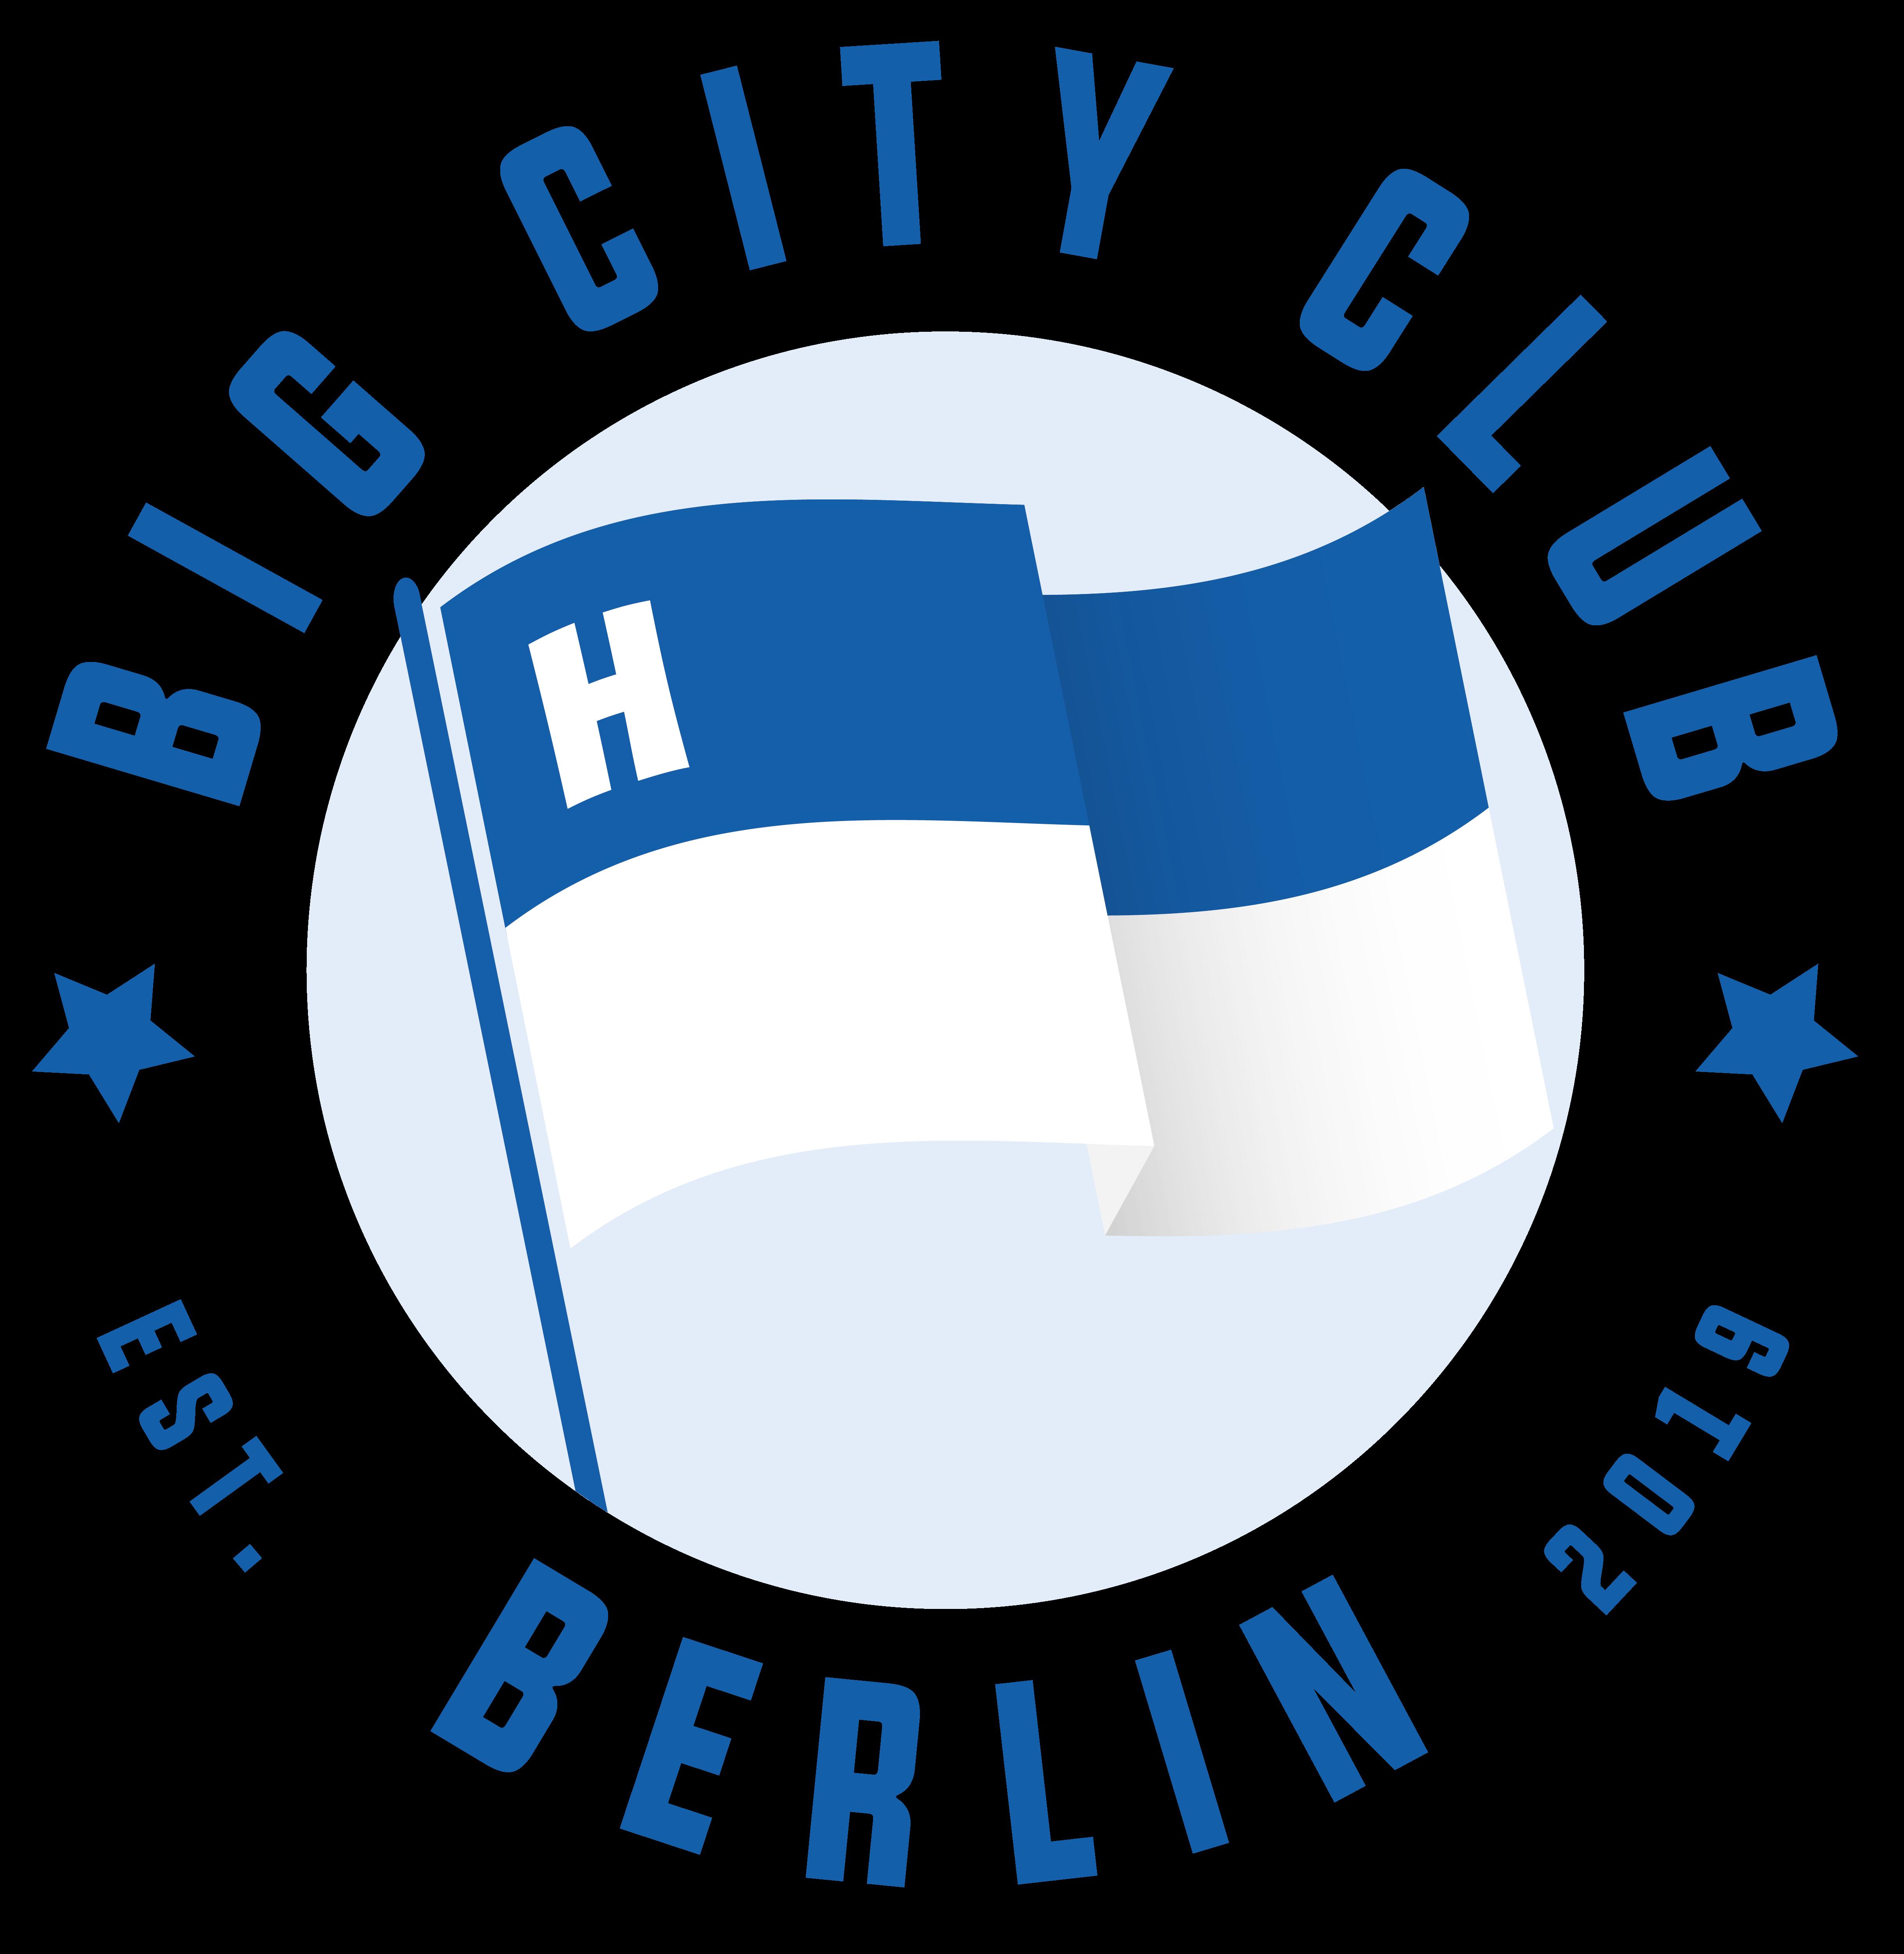 BIG CITY CLUB BERLIN